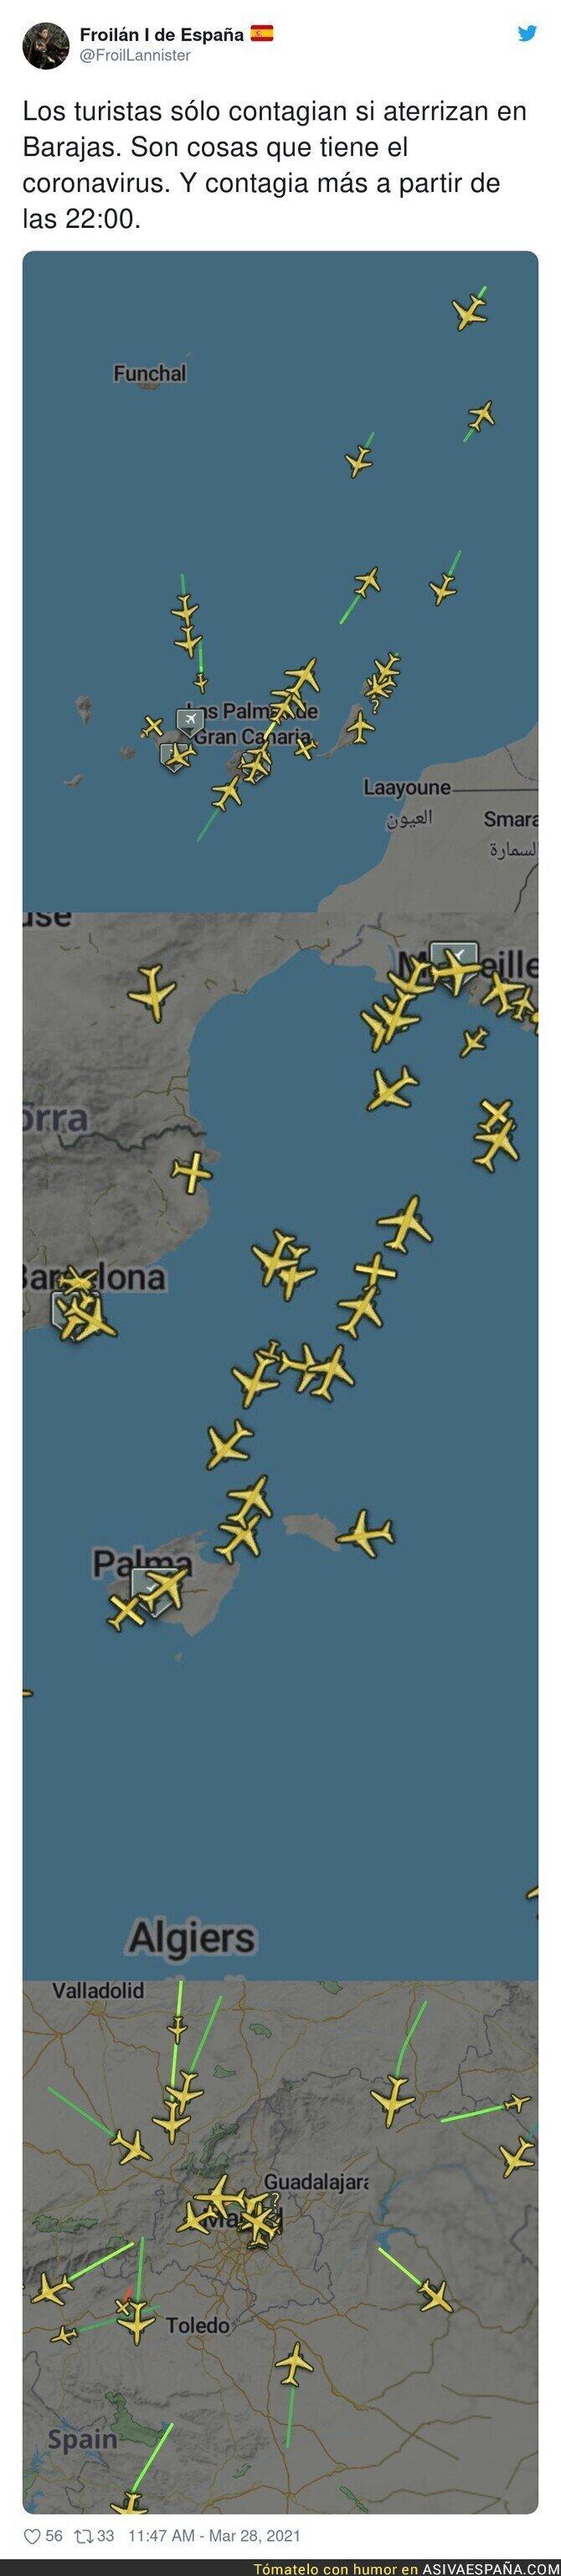 669004 - Así está el panorama aéreo